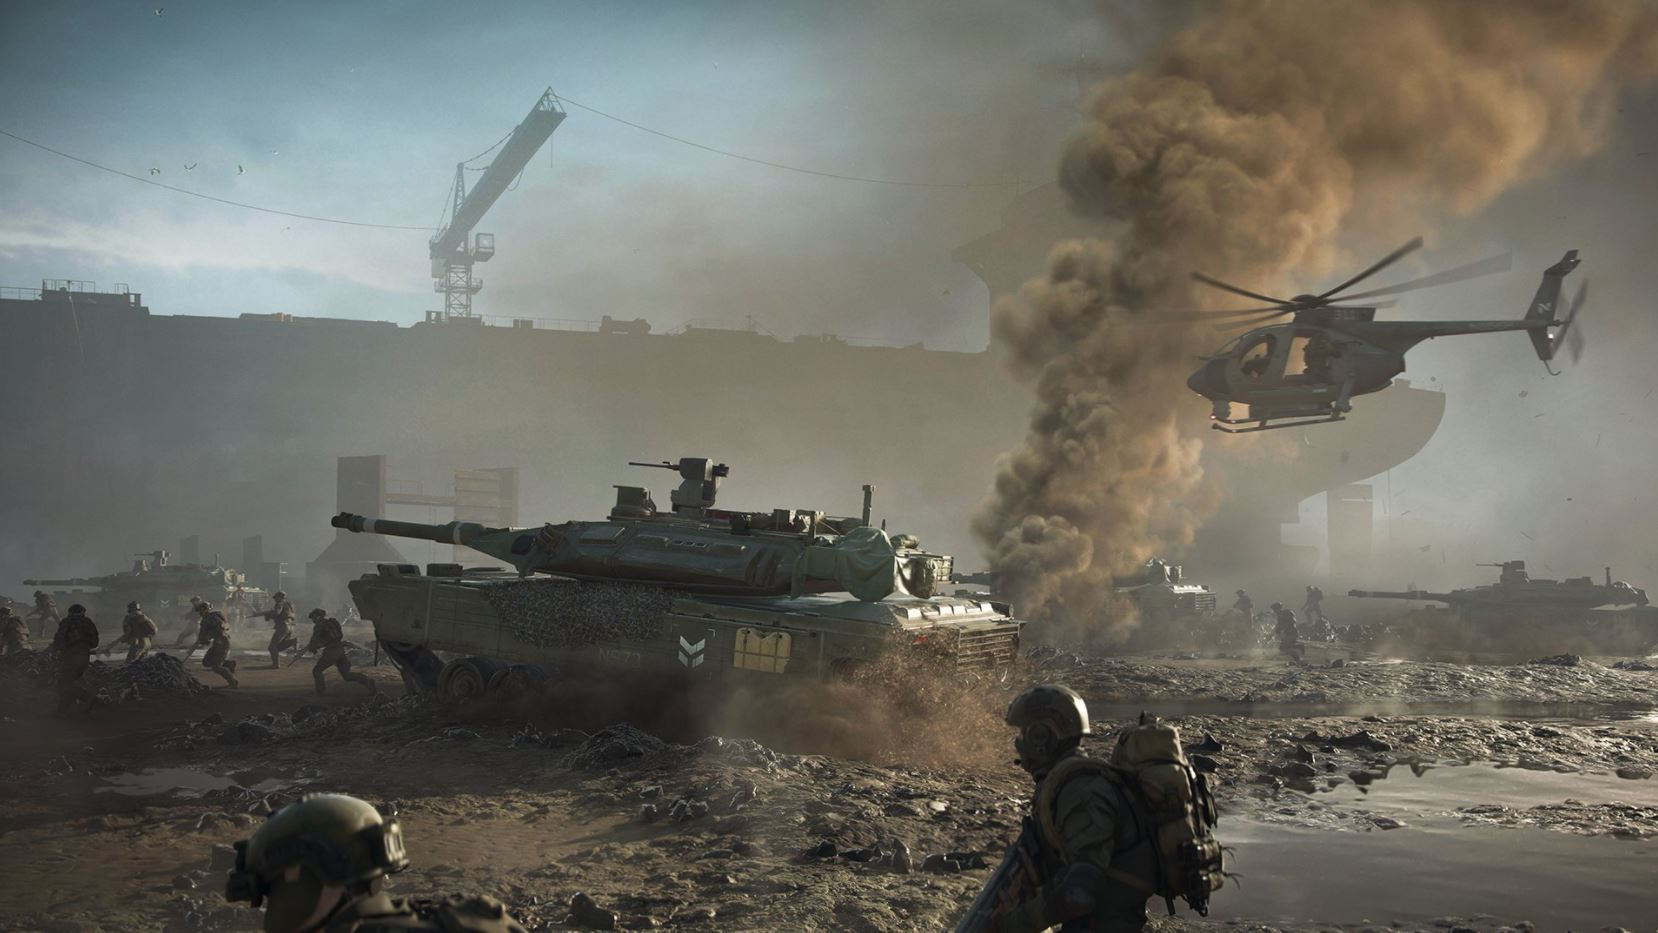 battlefield-2042-cover-art-and-screenshots-leak-on-origin-ahead-of-reveal-4